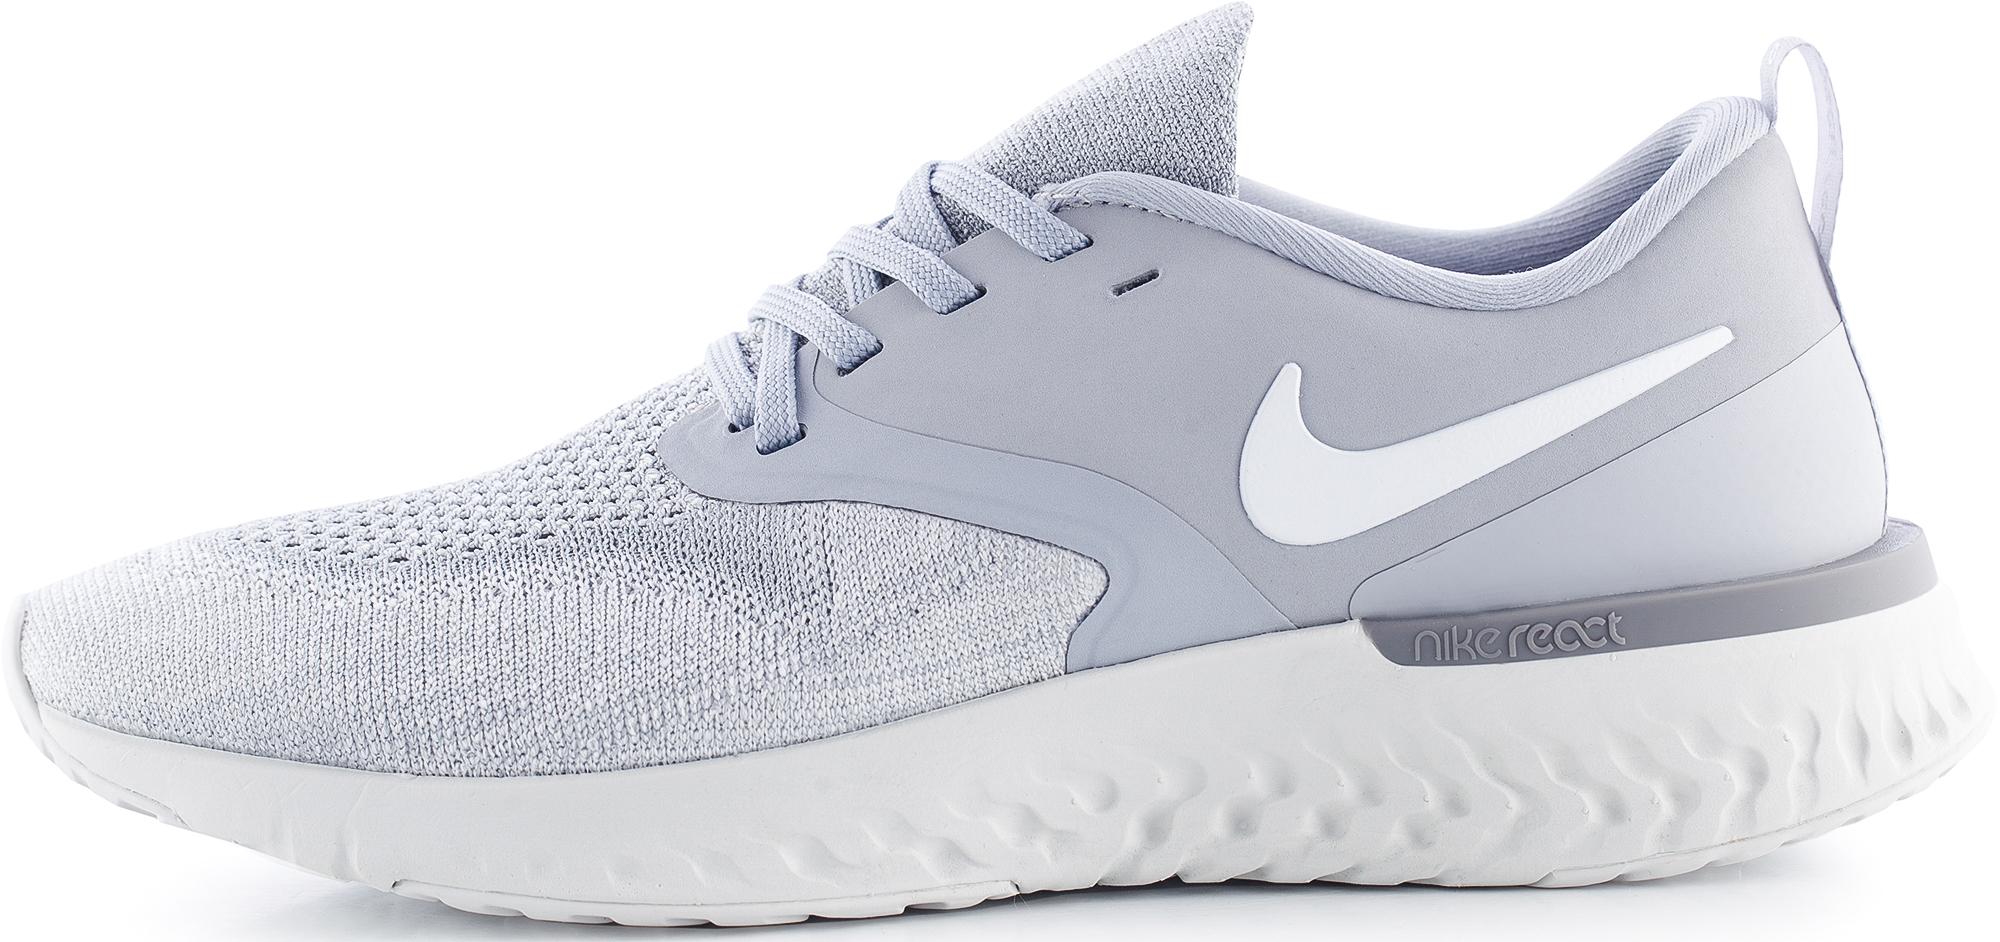 Nike Кроссовки женские Nike Odyssey React 2 Flyknit, размер 35,5 цена